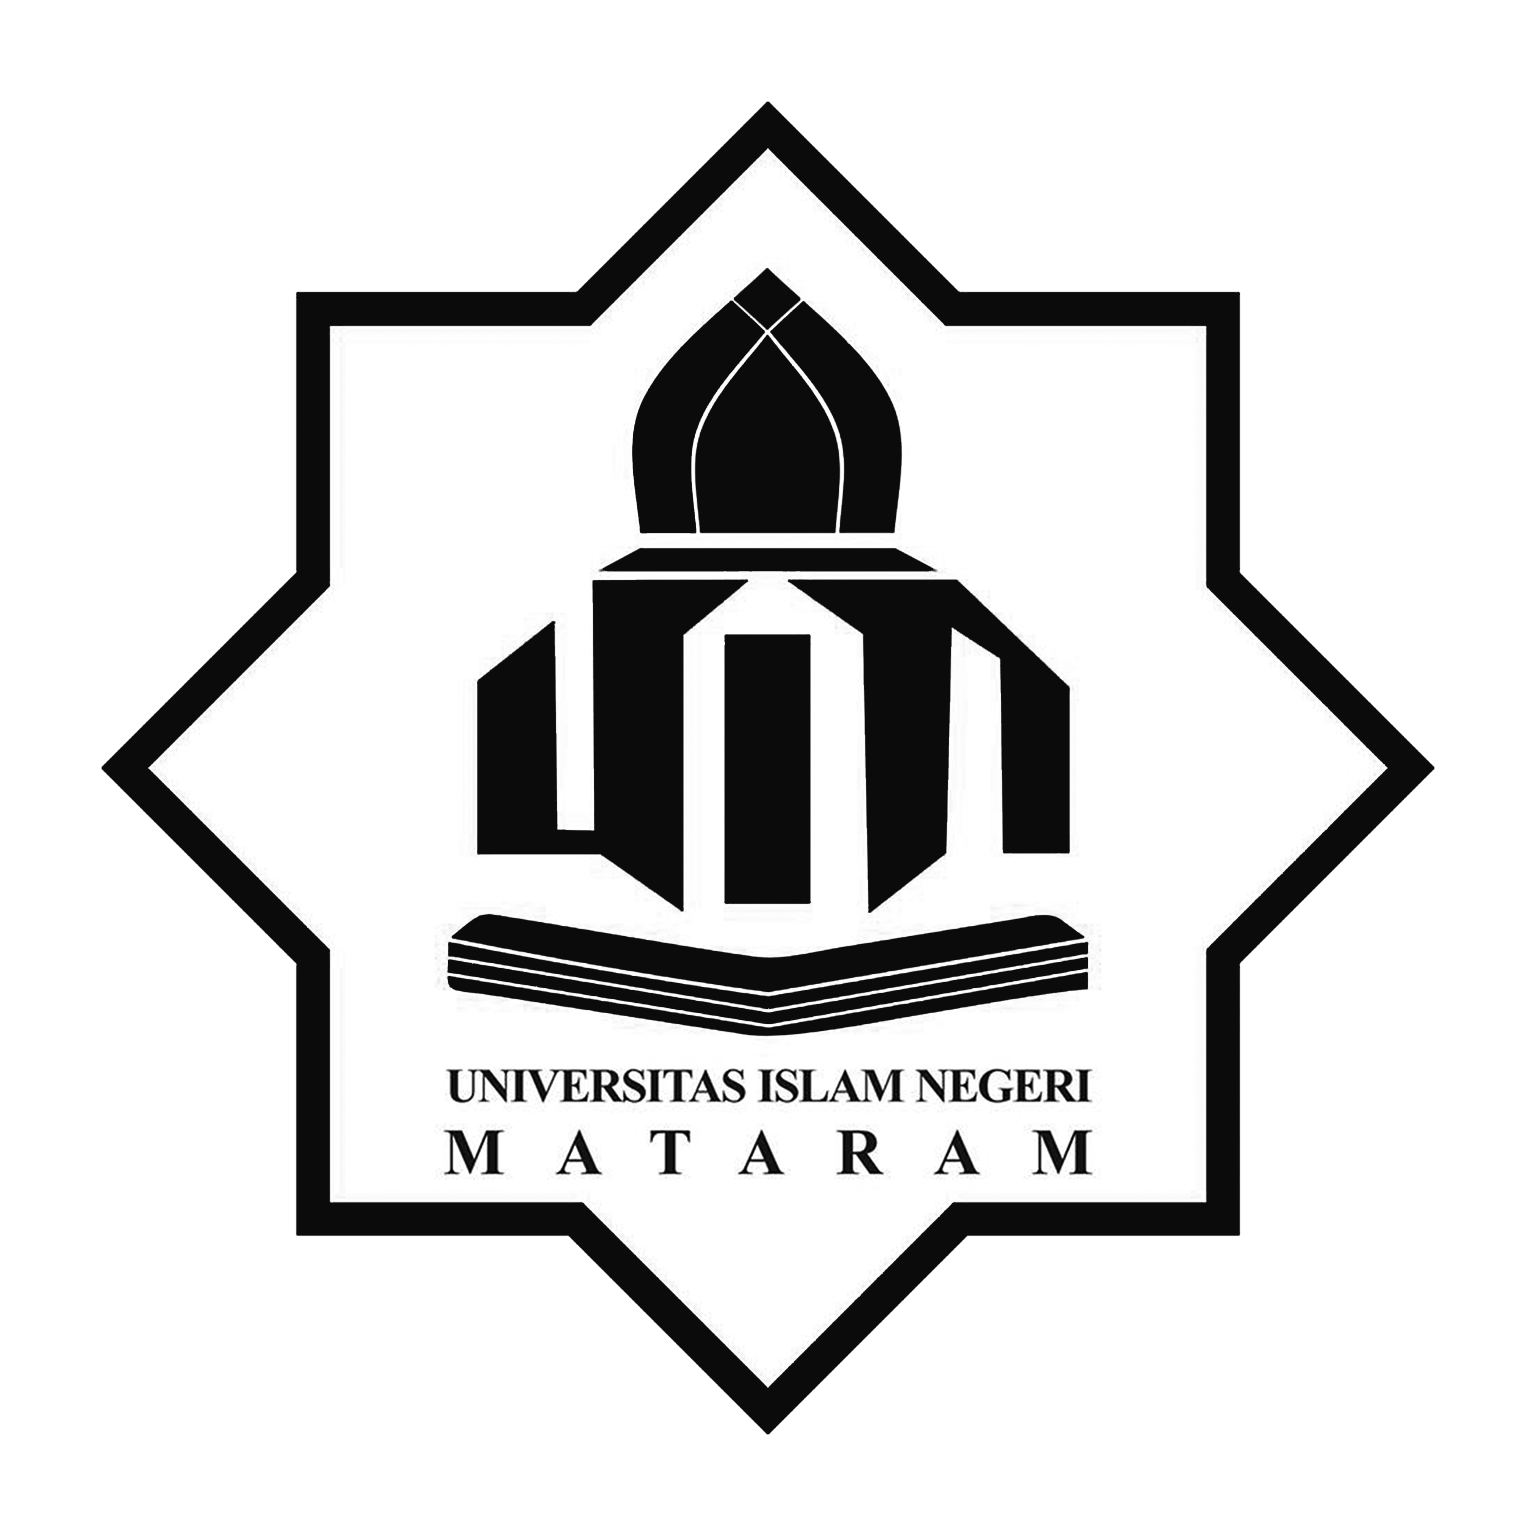 Logo UIN Mataram (Universitas Islam Negeri Mataram) Hitam Putih